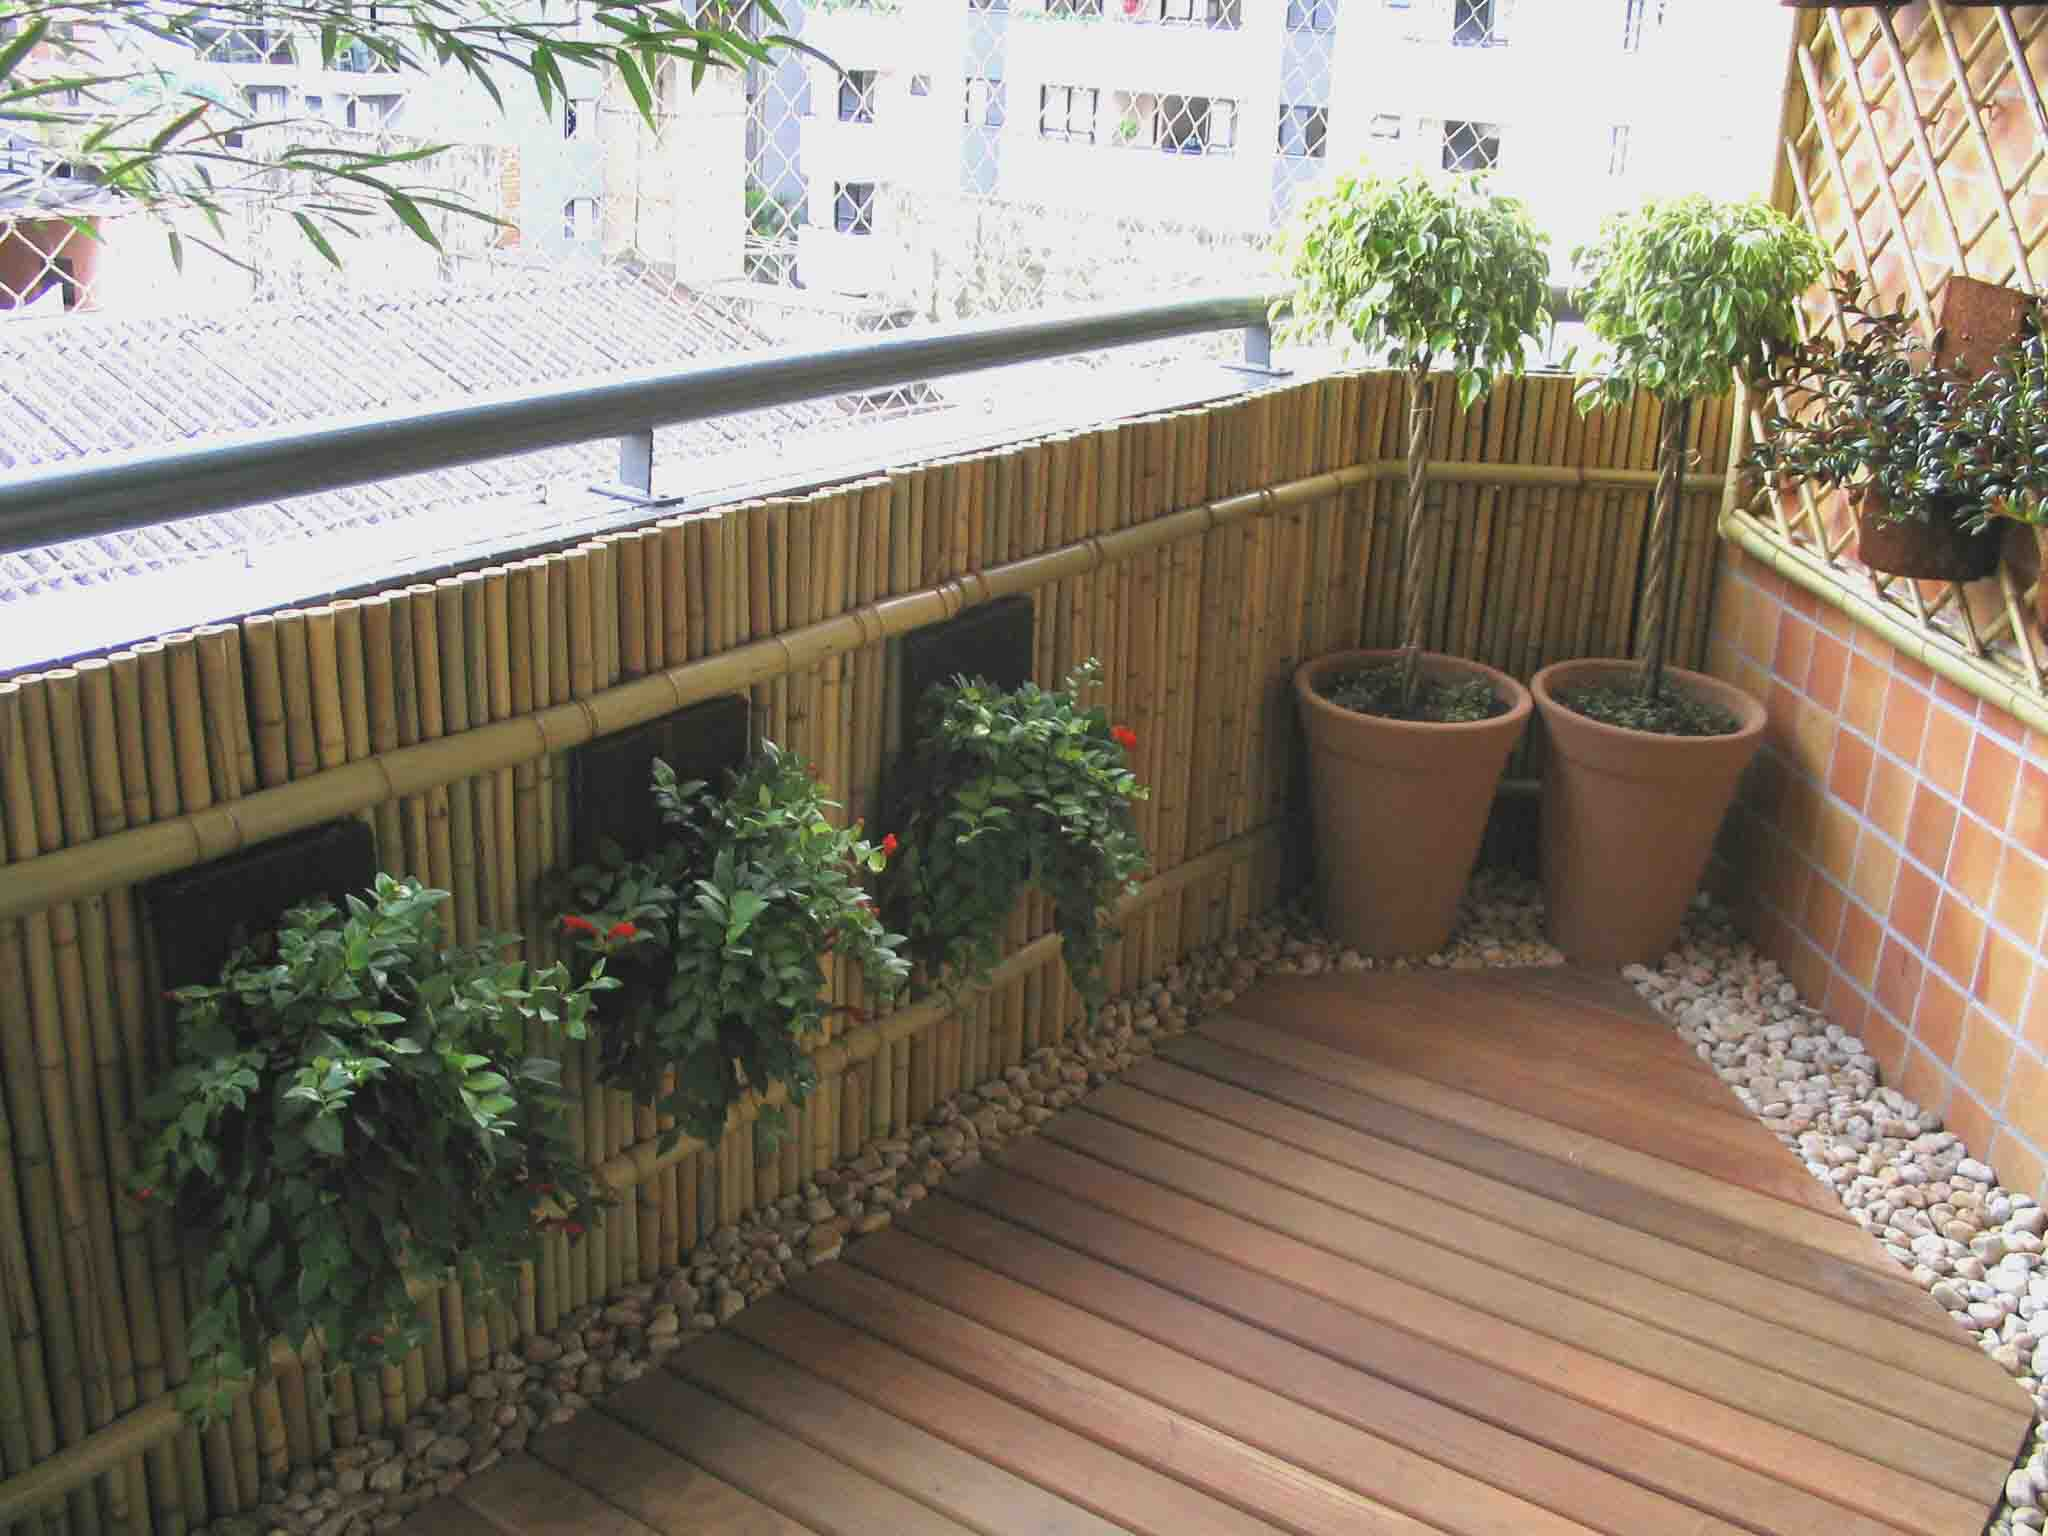 plantas para sacada de apartamento flores cultura mix. Black Bedroom Furniture Sets. Home Design Ideas